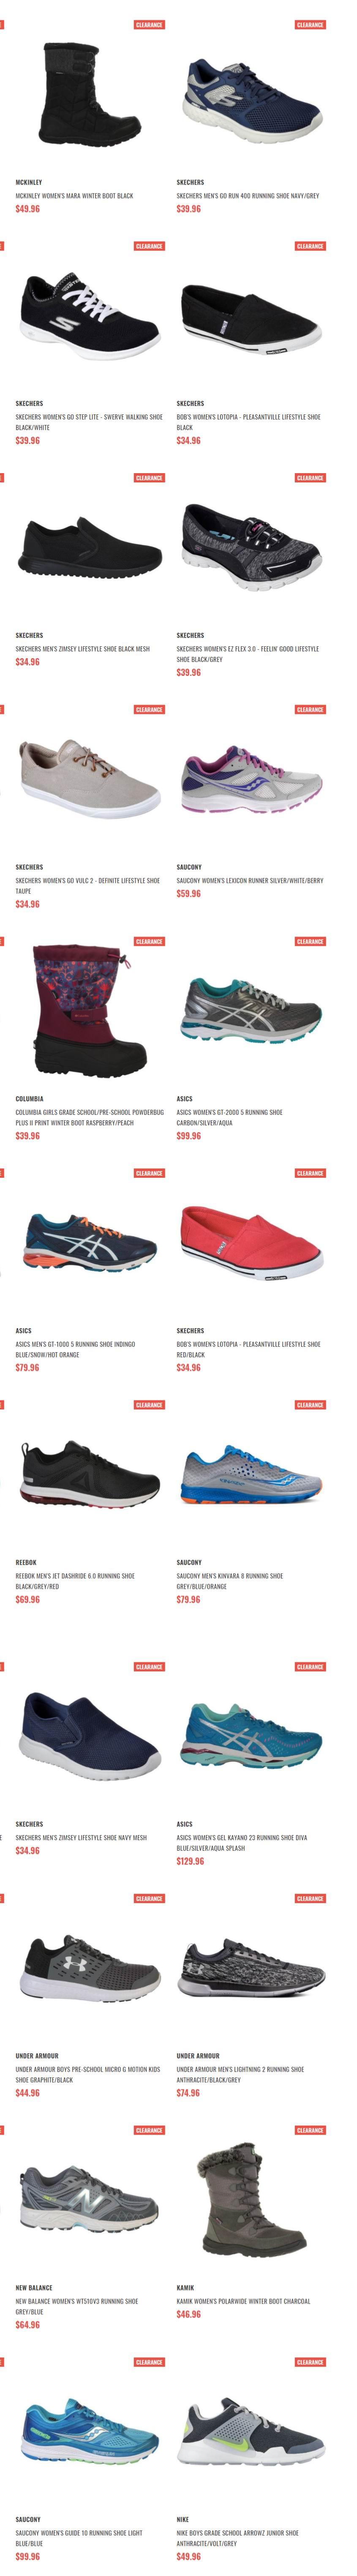 888b95fdc4 闪购!精选Nike、Skechers、New Balance、ASICS等品牌运动鞋5折起+全场满 ...